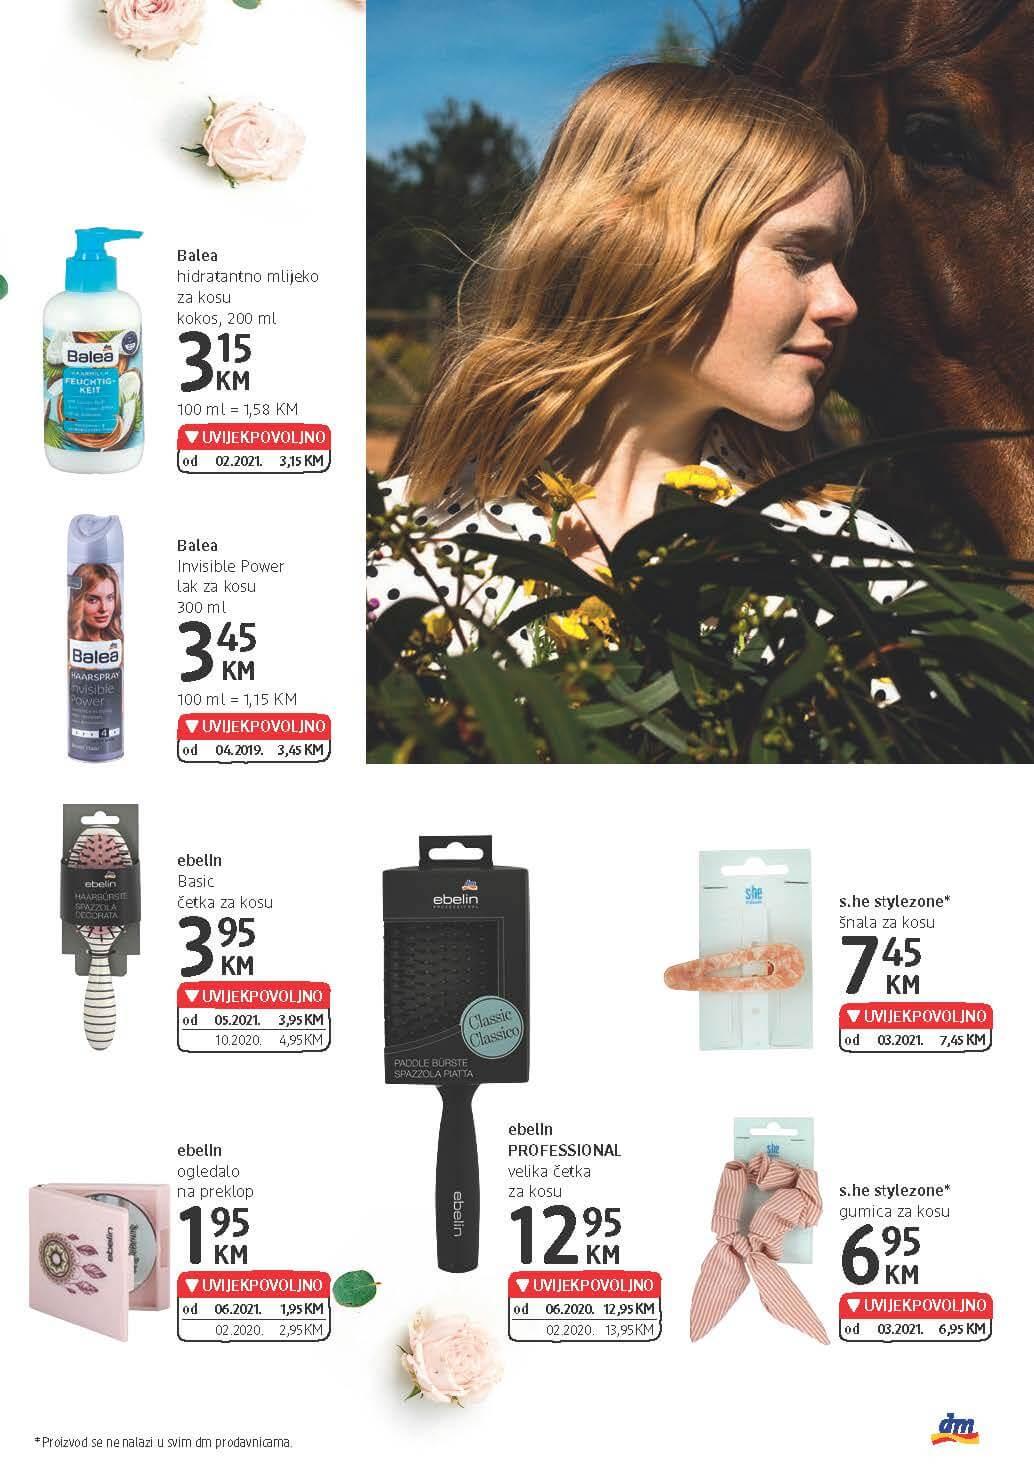 DM Katalog BiH JUN 2021 09.06. 22.06. eKatalozi.com PR Page 17